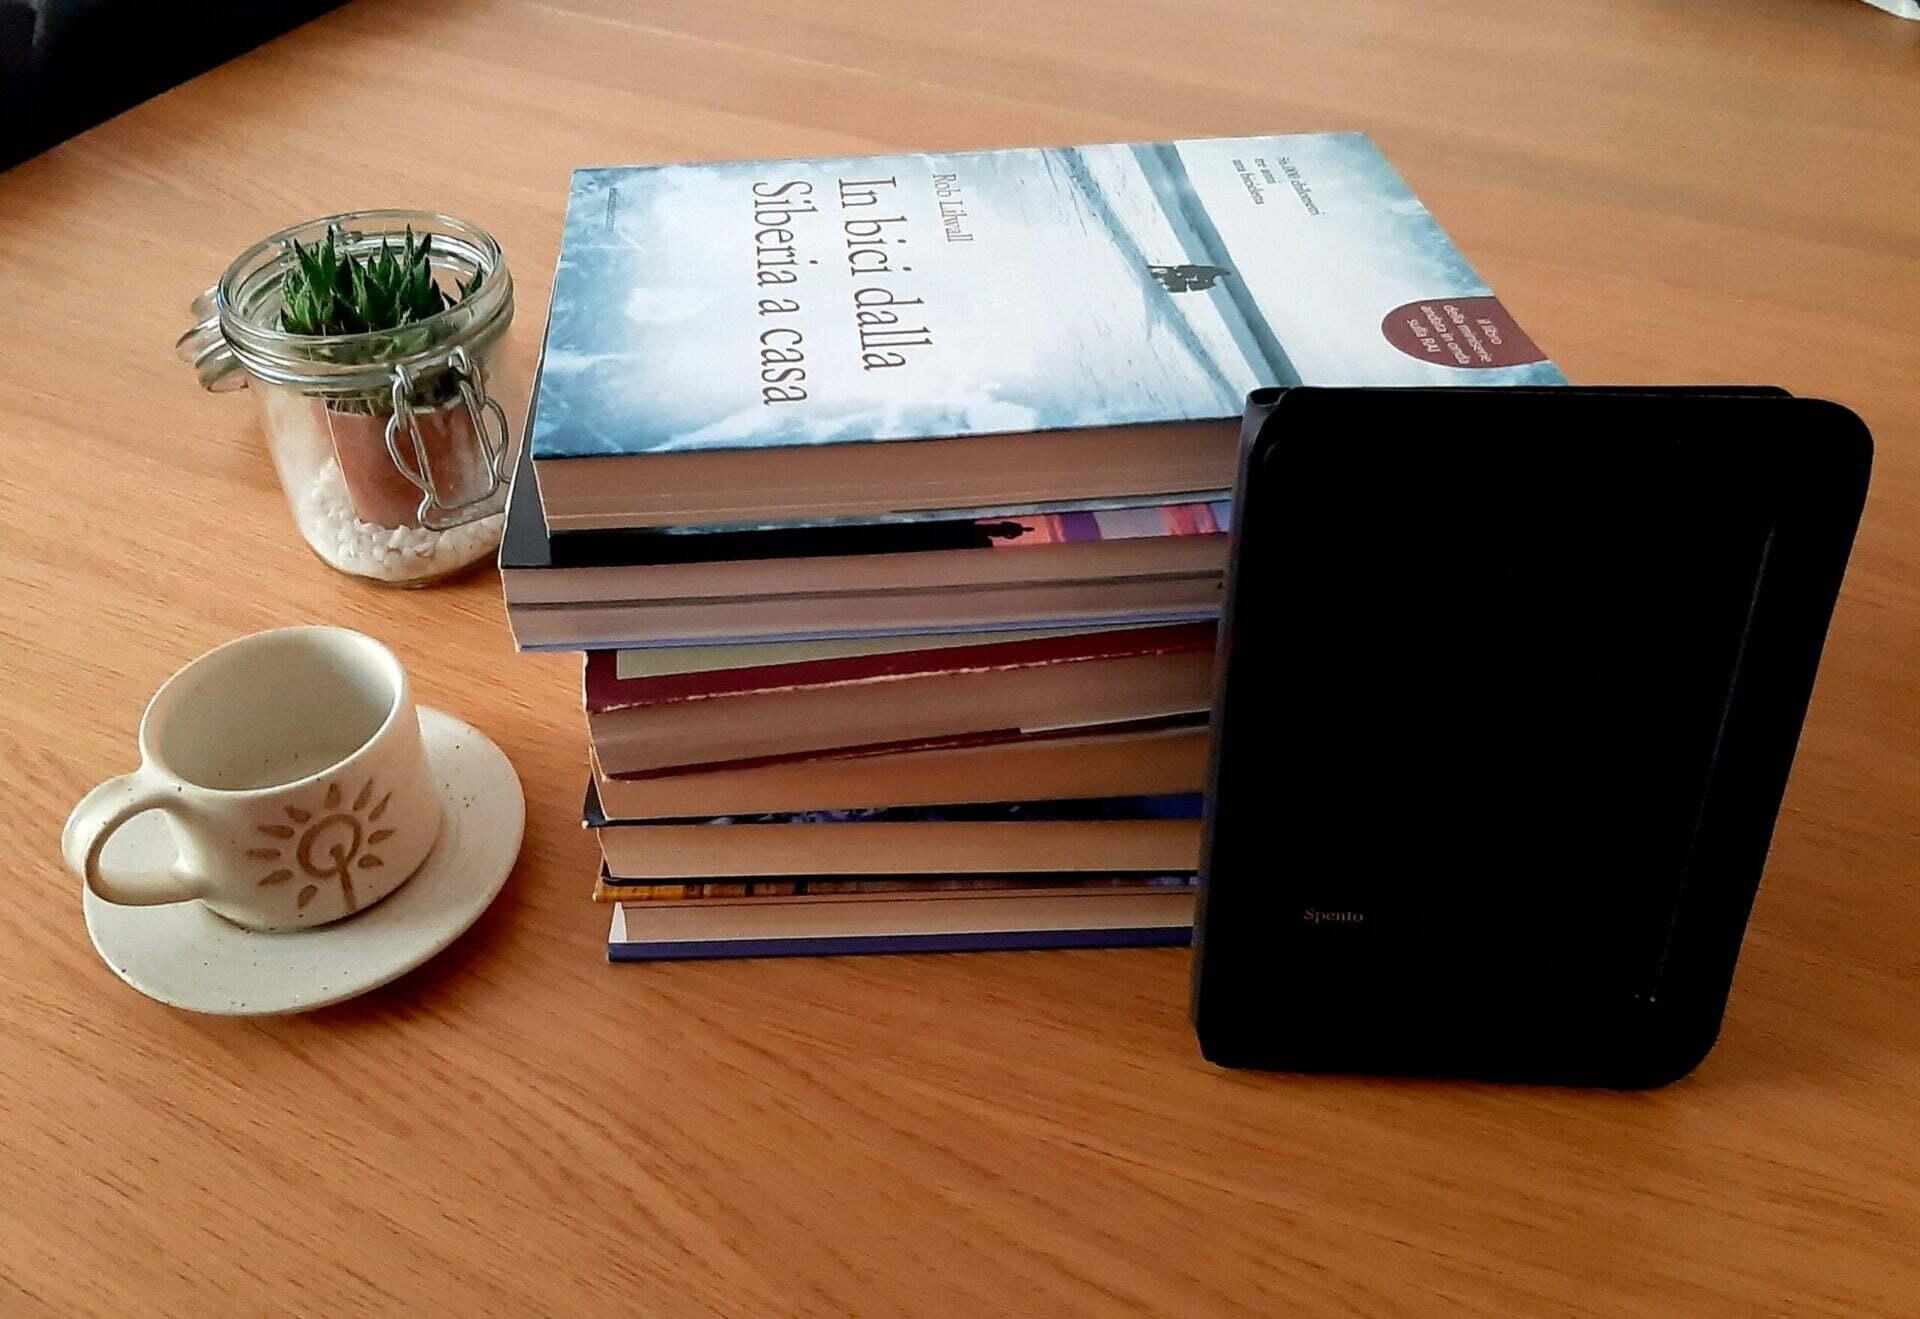 Libri e sostenibilità: volumi cartacei o ebook?